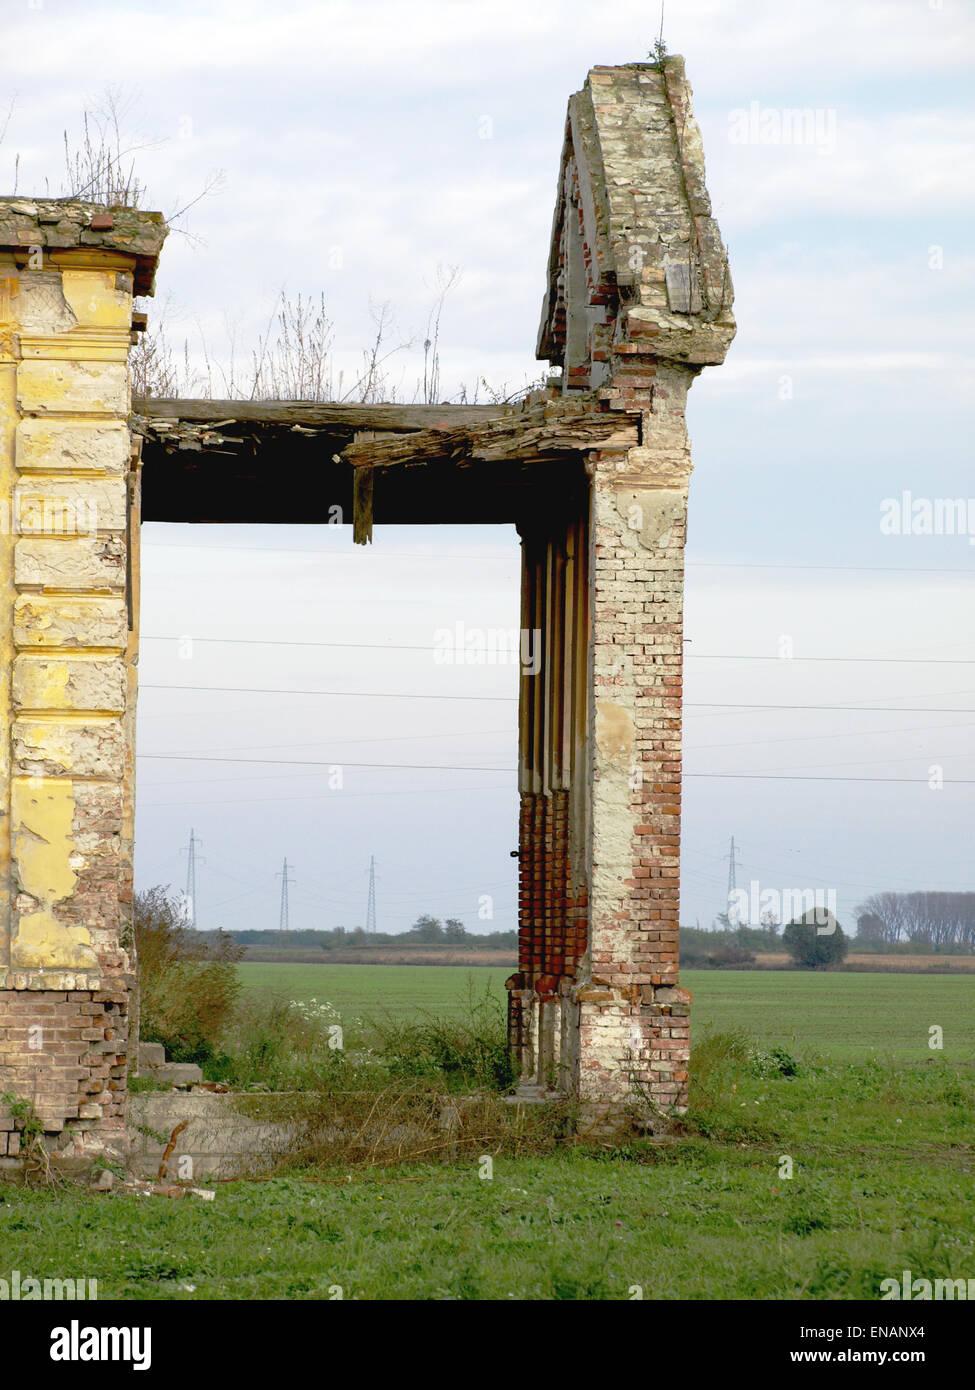 Demolished and destroyed the abandoned castle - Stock Image